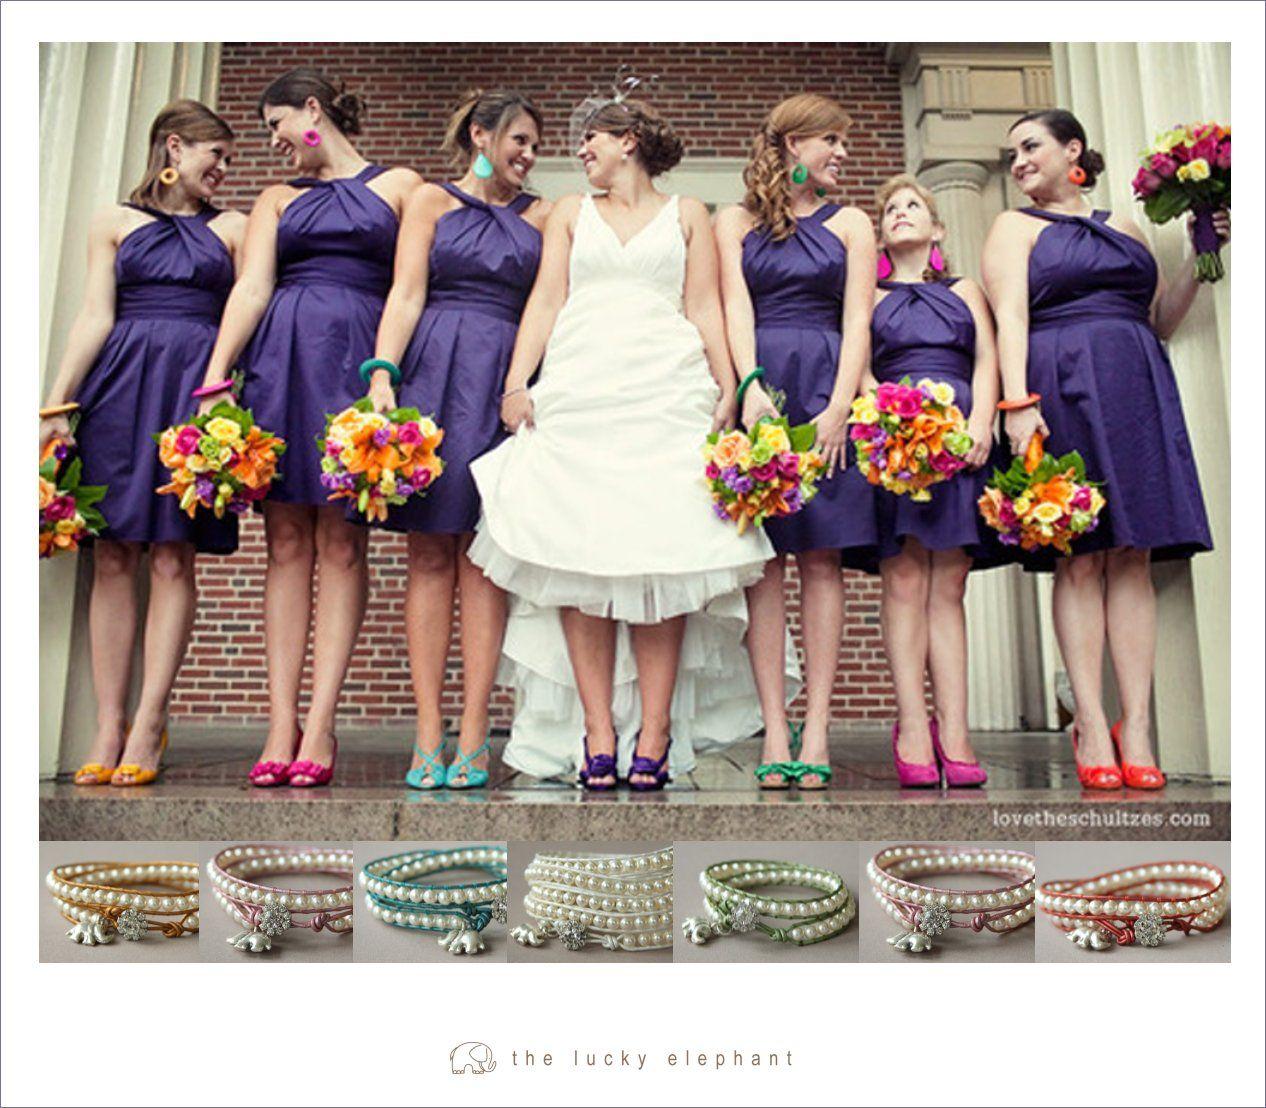 Mix And Match Bridesmaids Mismatched Bridesmaid Dresses